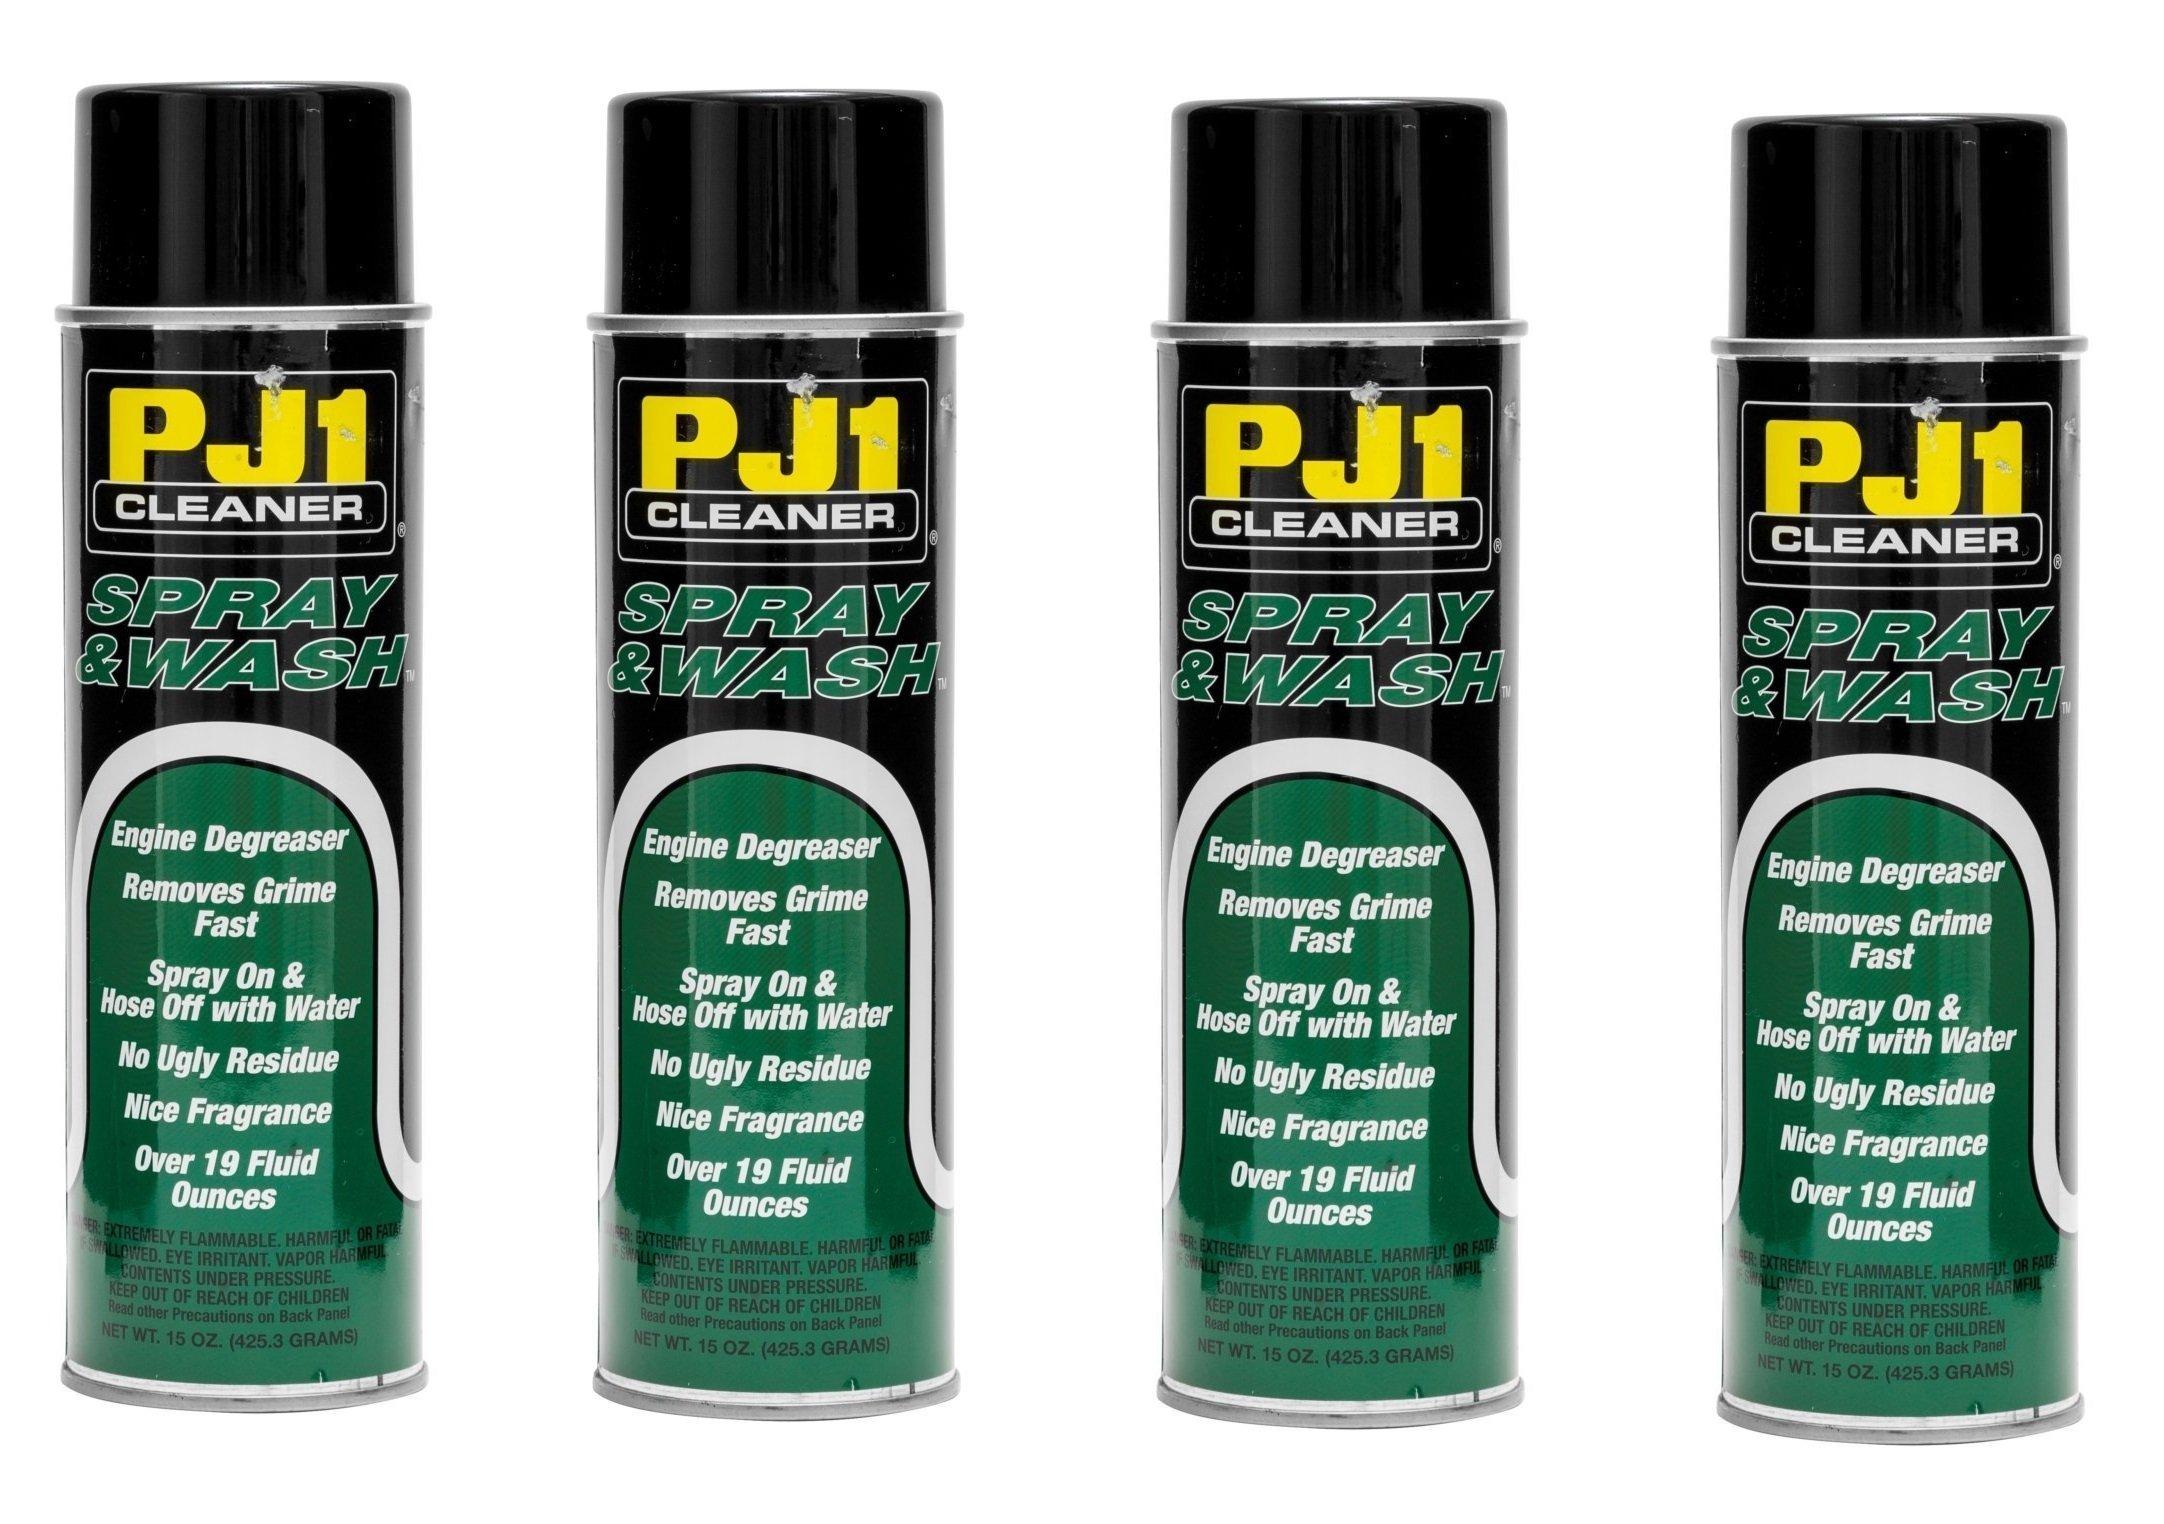 PJH 15-20-1 Pj1 Spray N Wash Degreaser - California Compliant, 15Oz. (4)